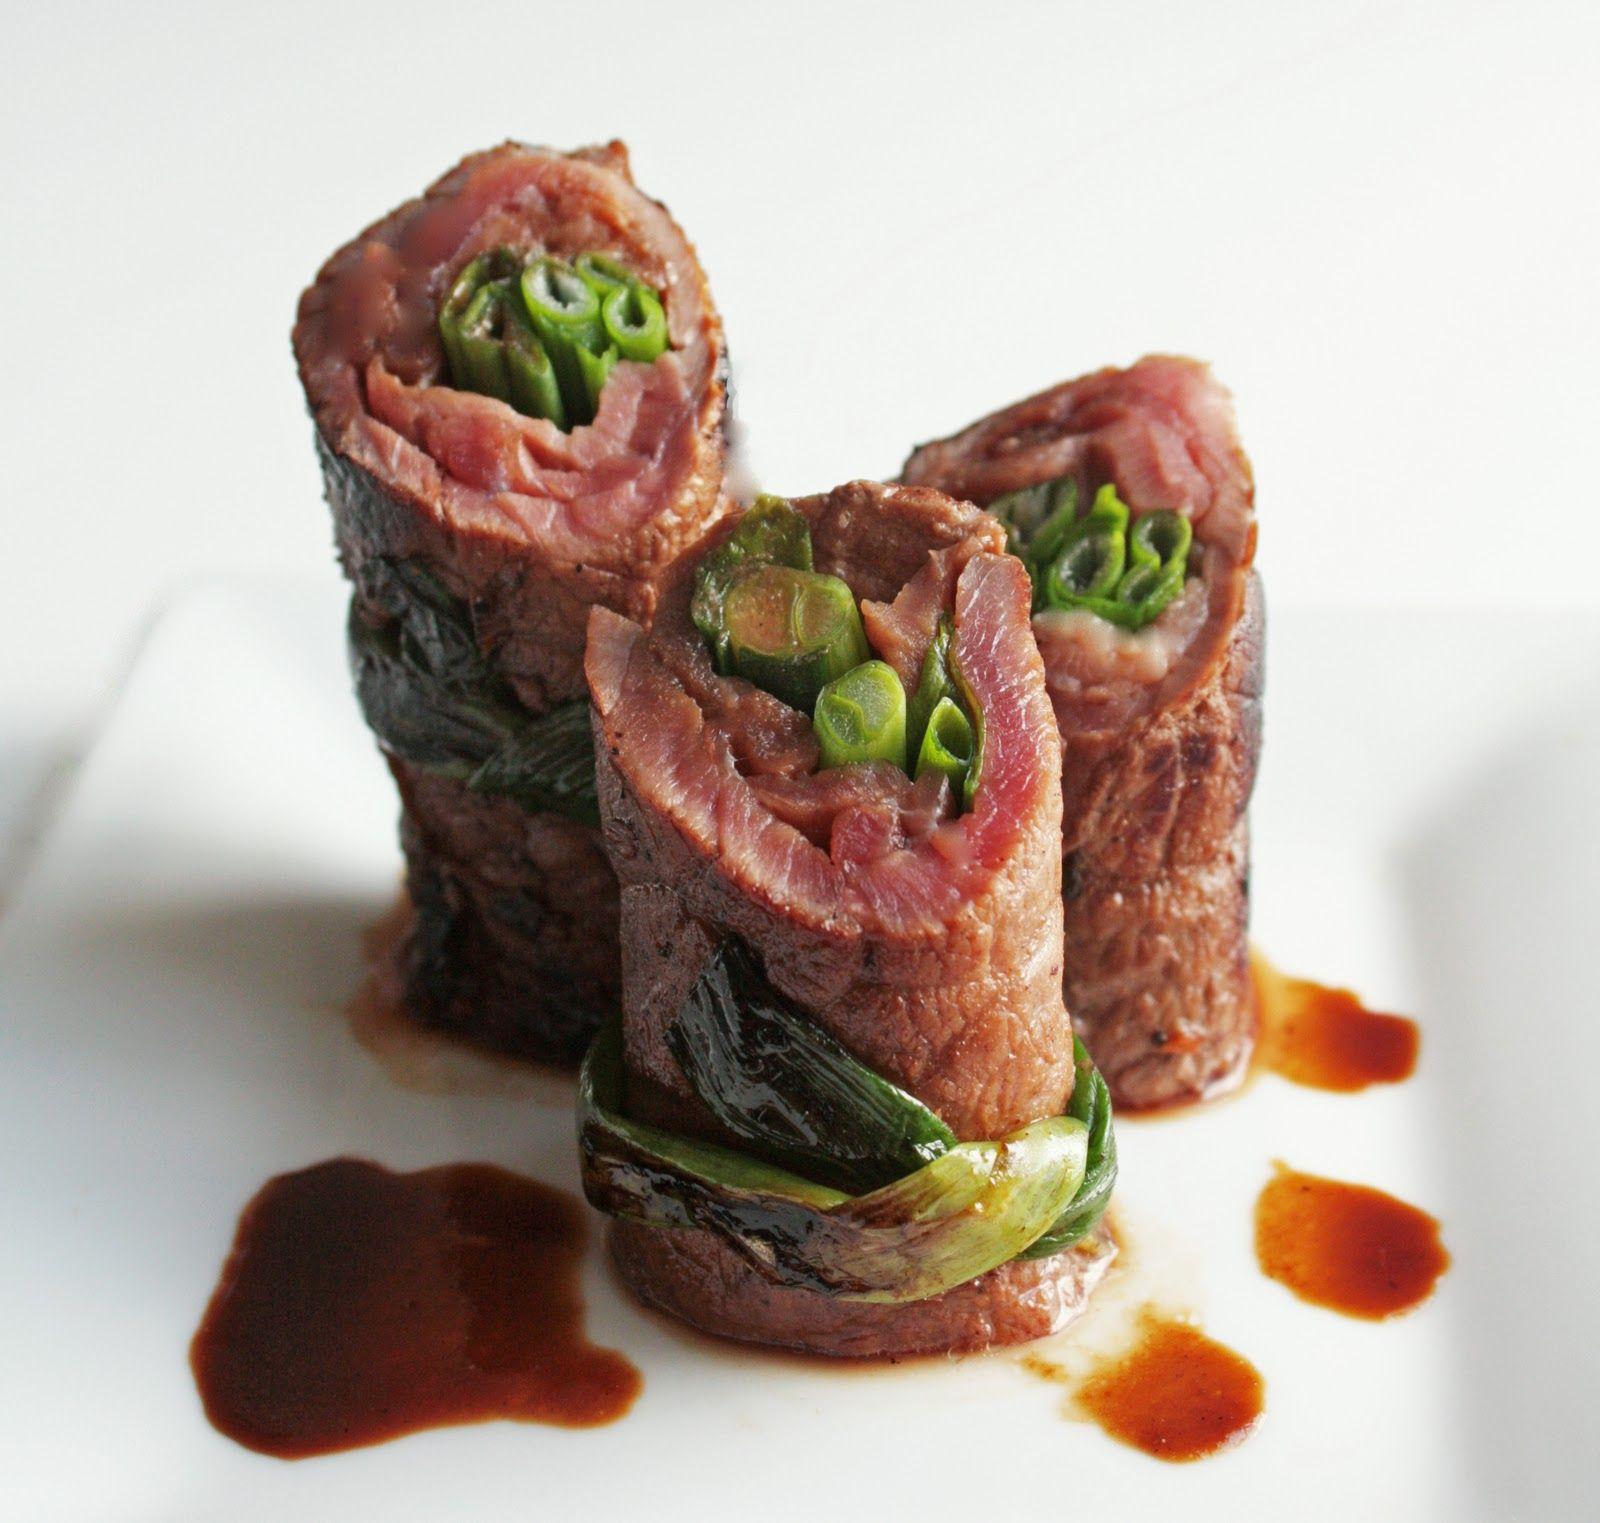 Beef Negimaki (Steak & Scallion Rolls) - omit brown sugar for a low-carb recipe